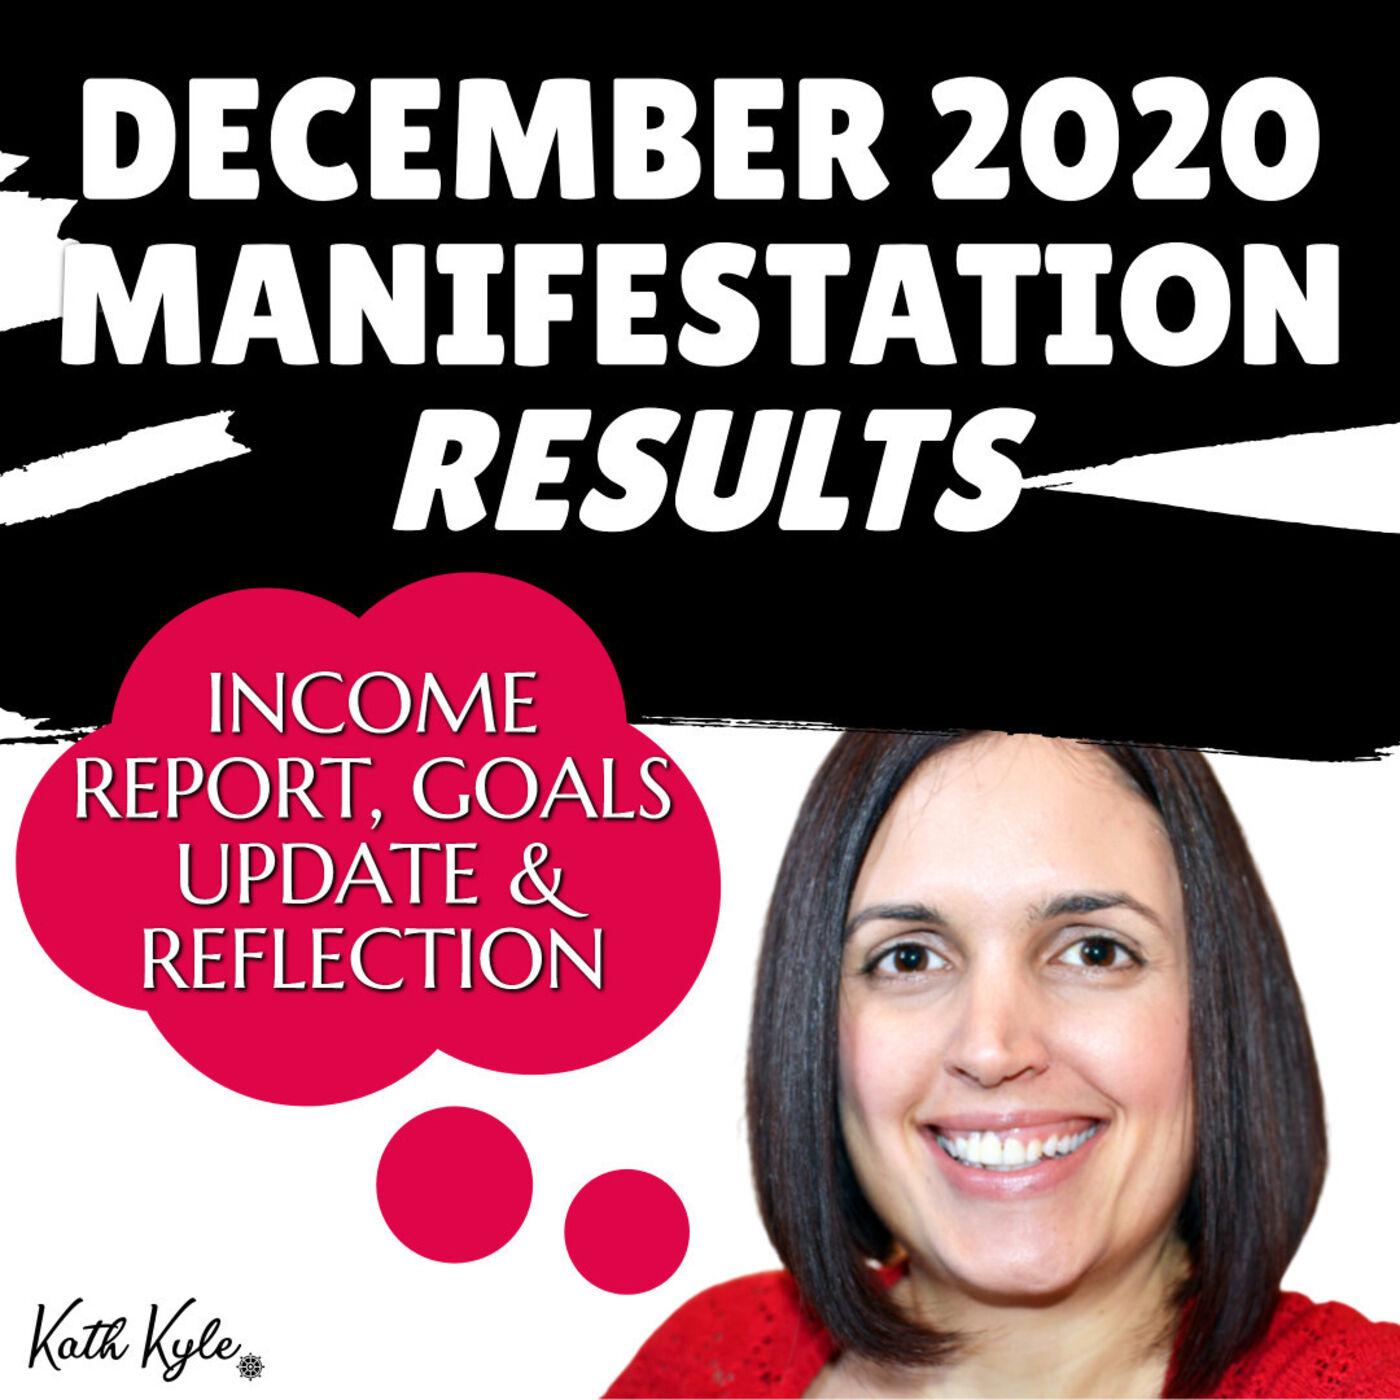 December 2020 Manifestation RESULTS: Income Report, Goals Update & Reflection